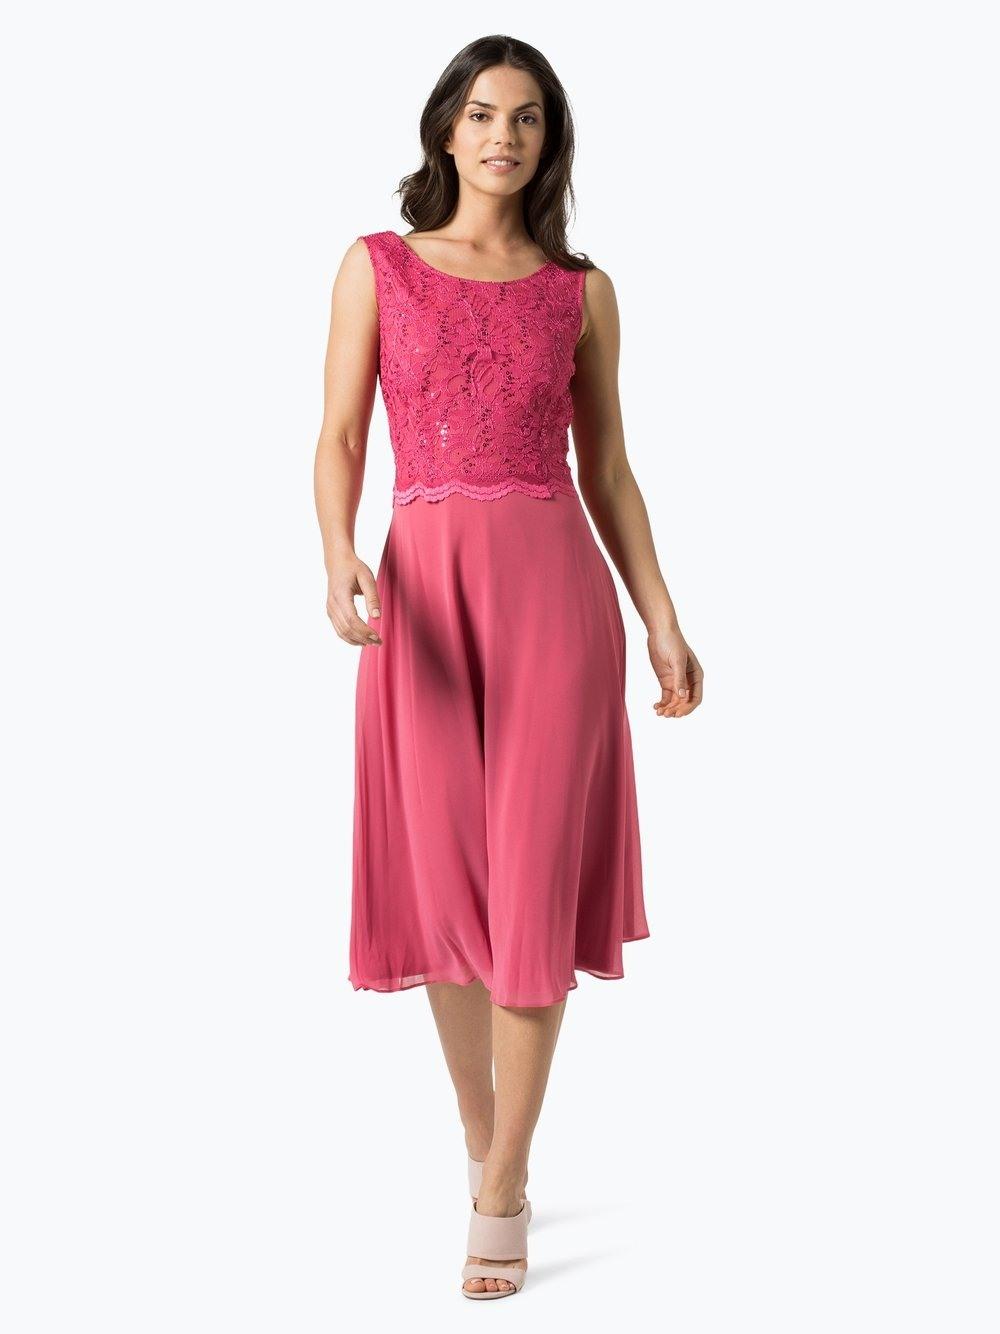 Perfekt Abendkleid Pink Ärmel20 Luxus Abendkleid Pink Galerie